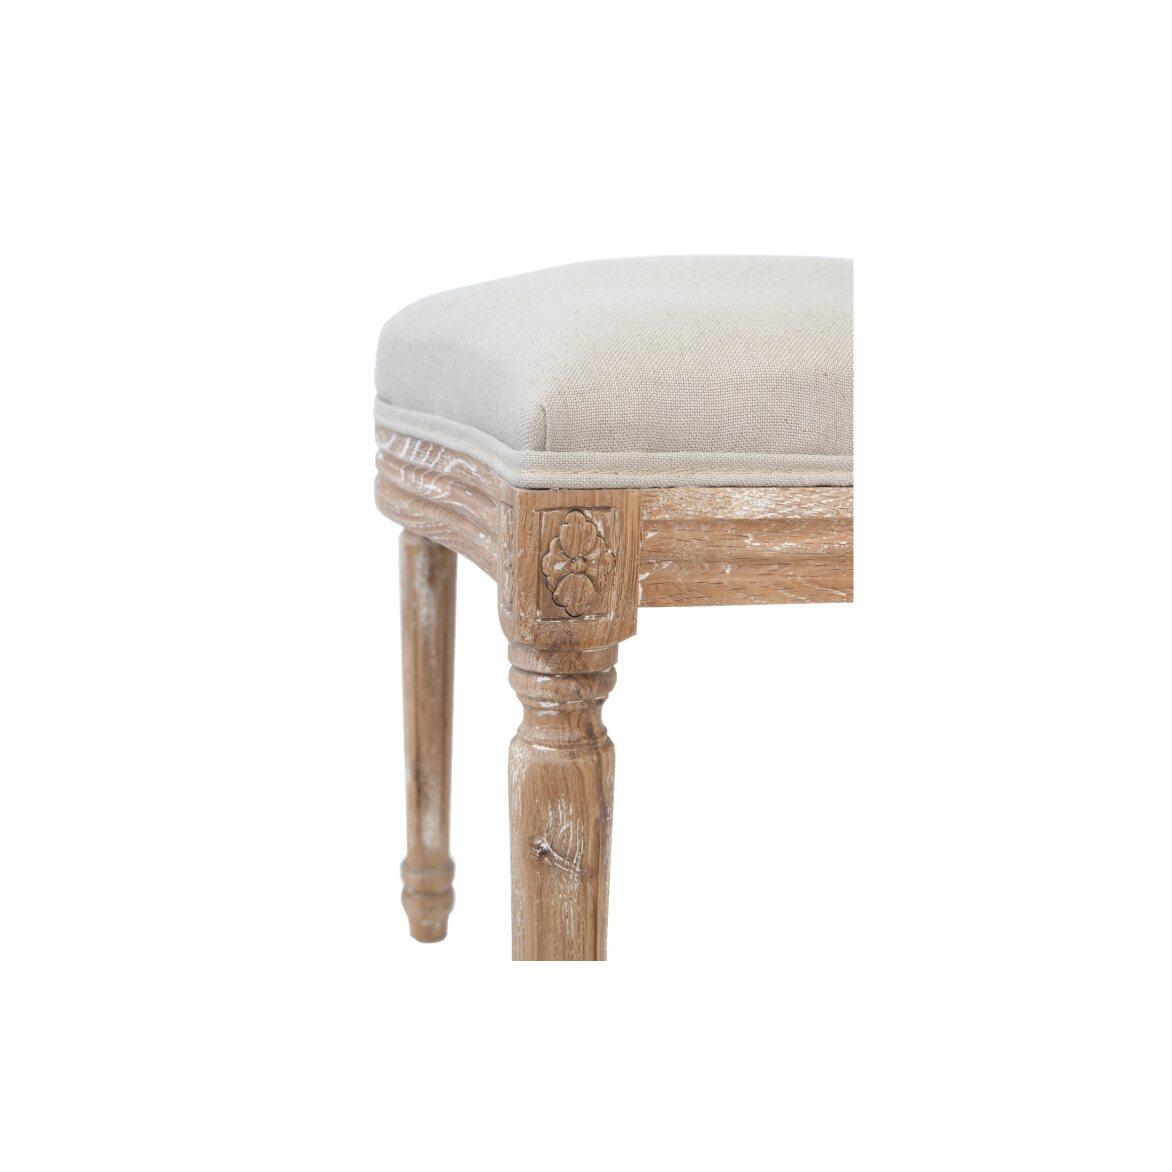 Стул Miro beige 5 | Обеденные стулья Kingsby